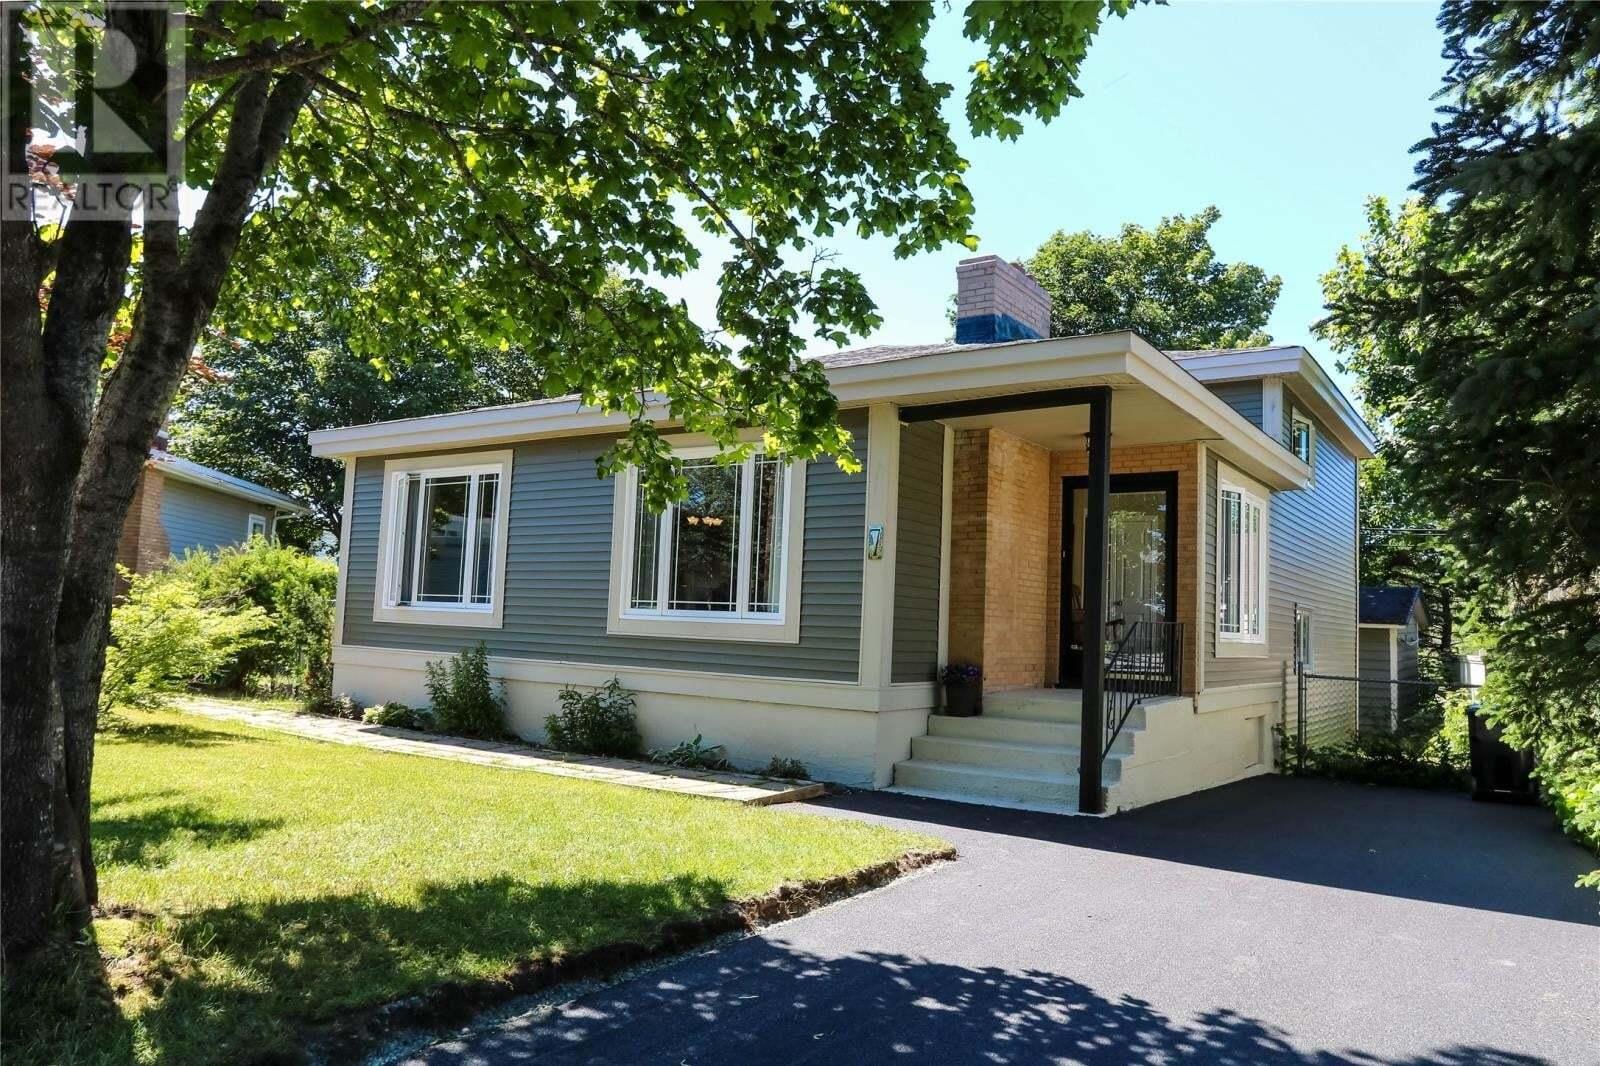 House for sale at 7 Limerick Pl St. John's Newfoundland - MLS: 1217310